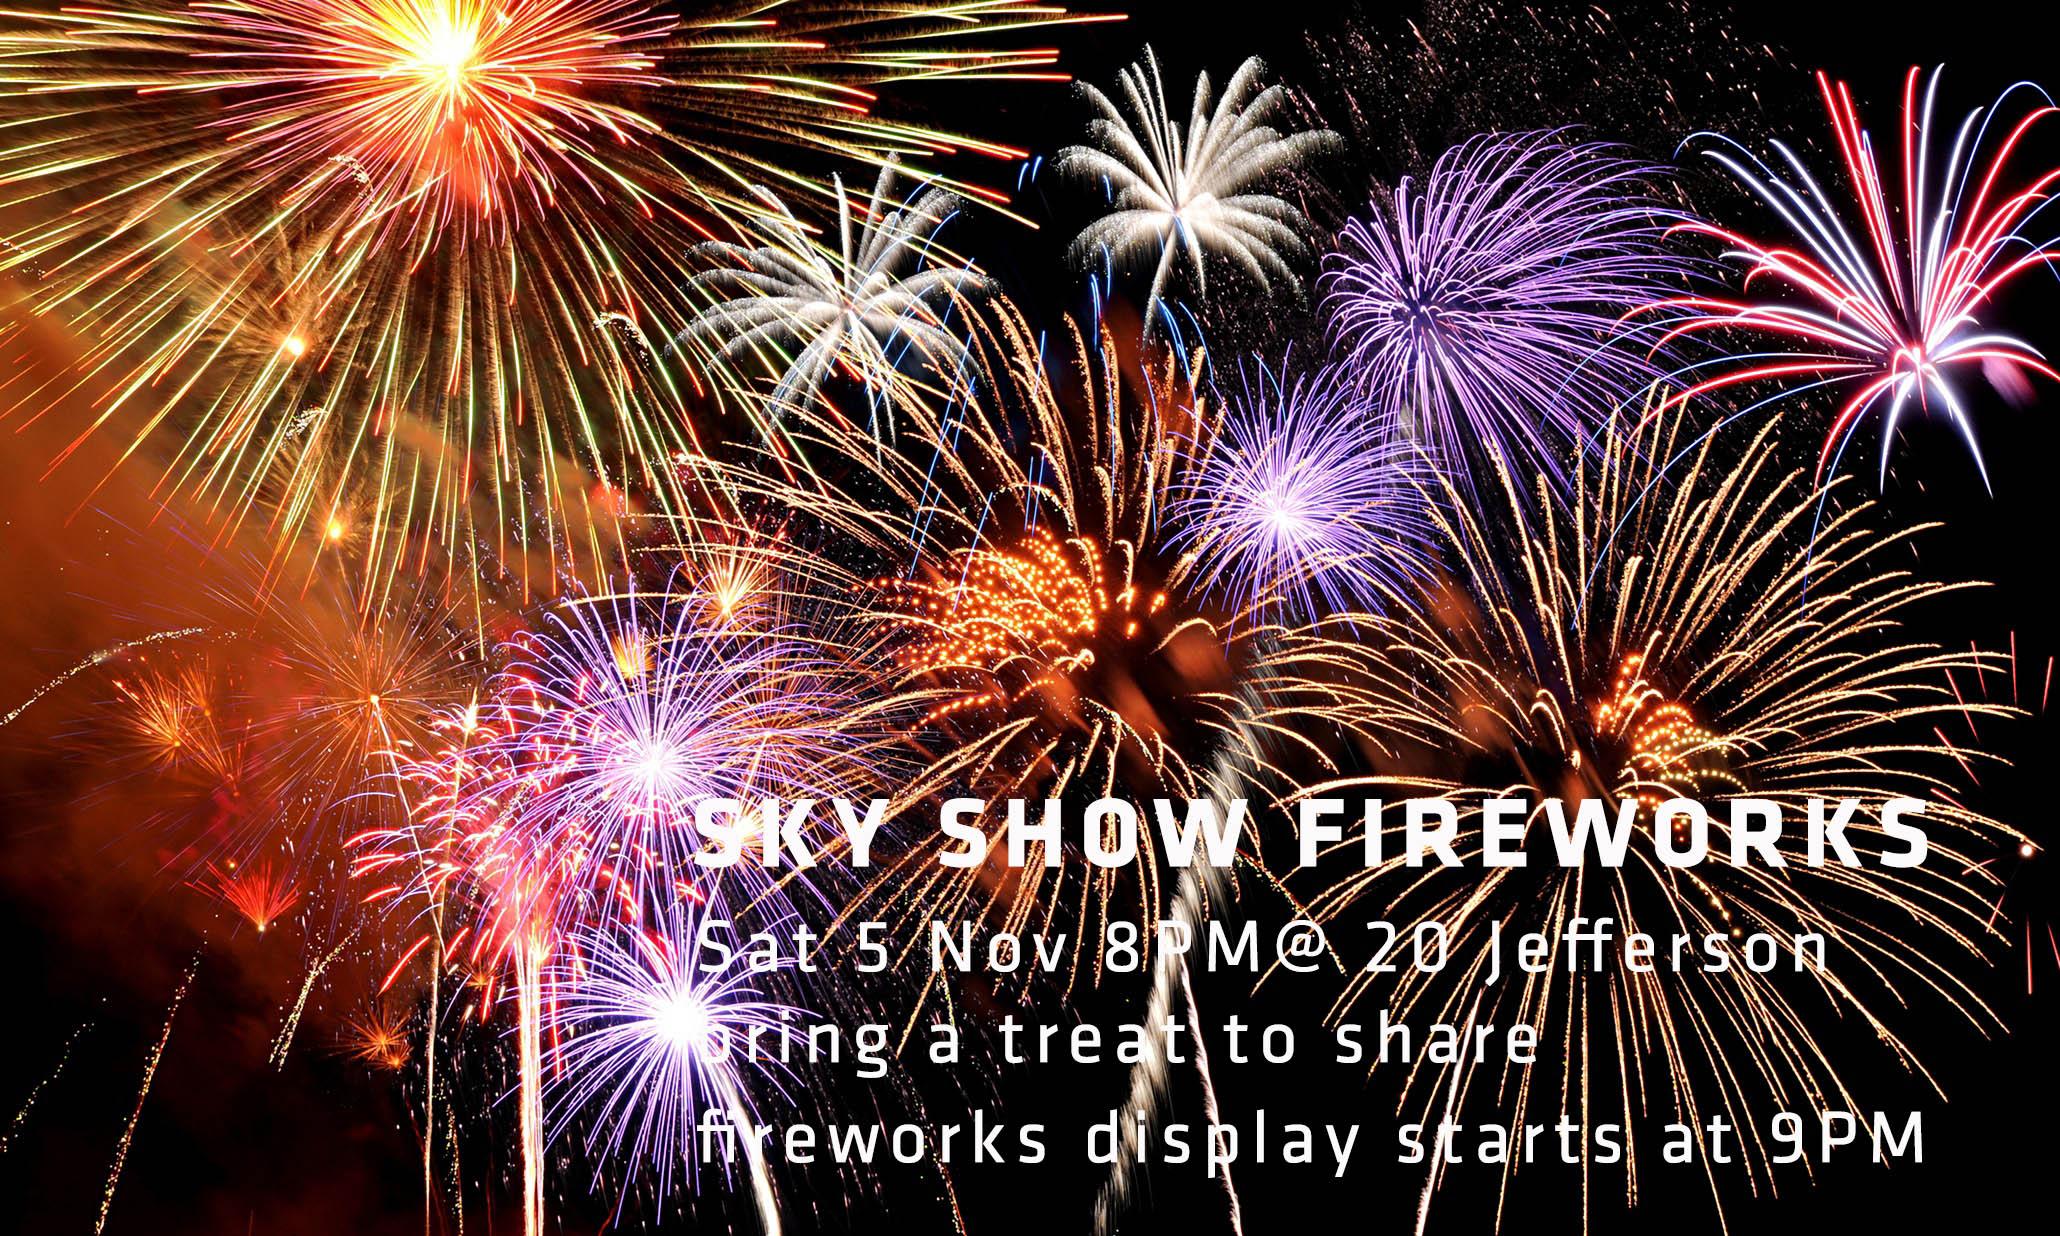 Fireworks of various colors bursting against a black background